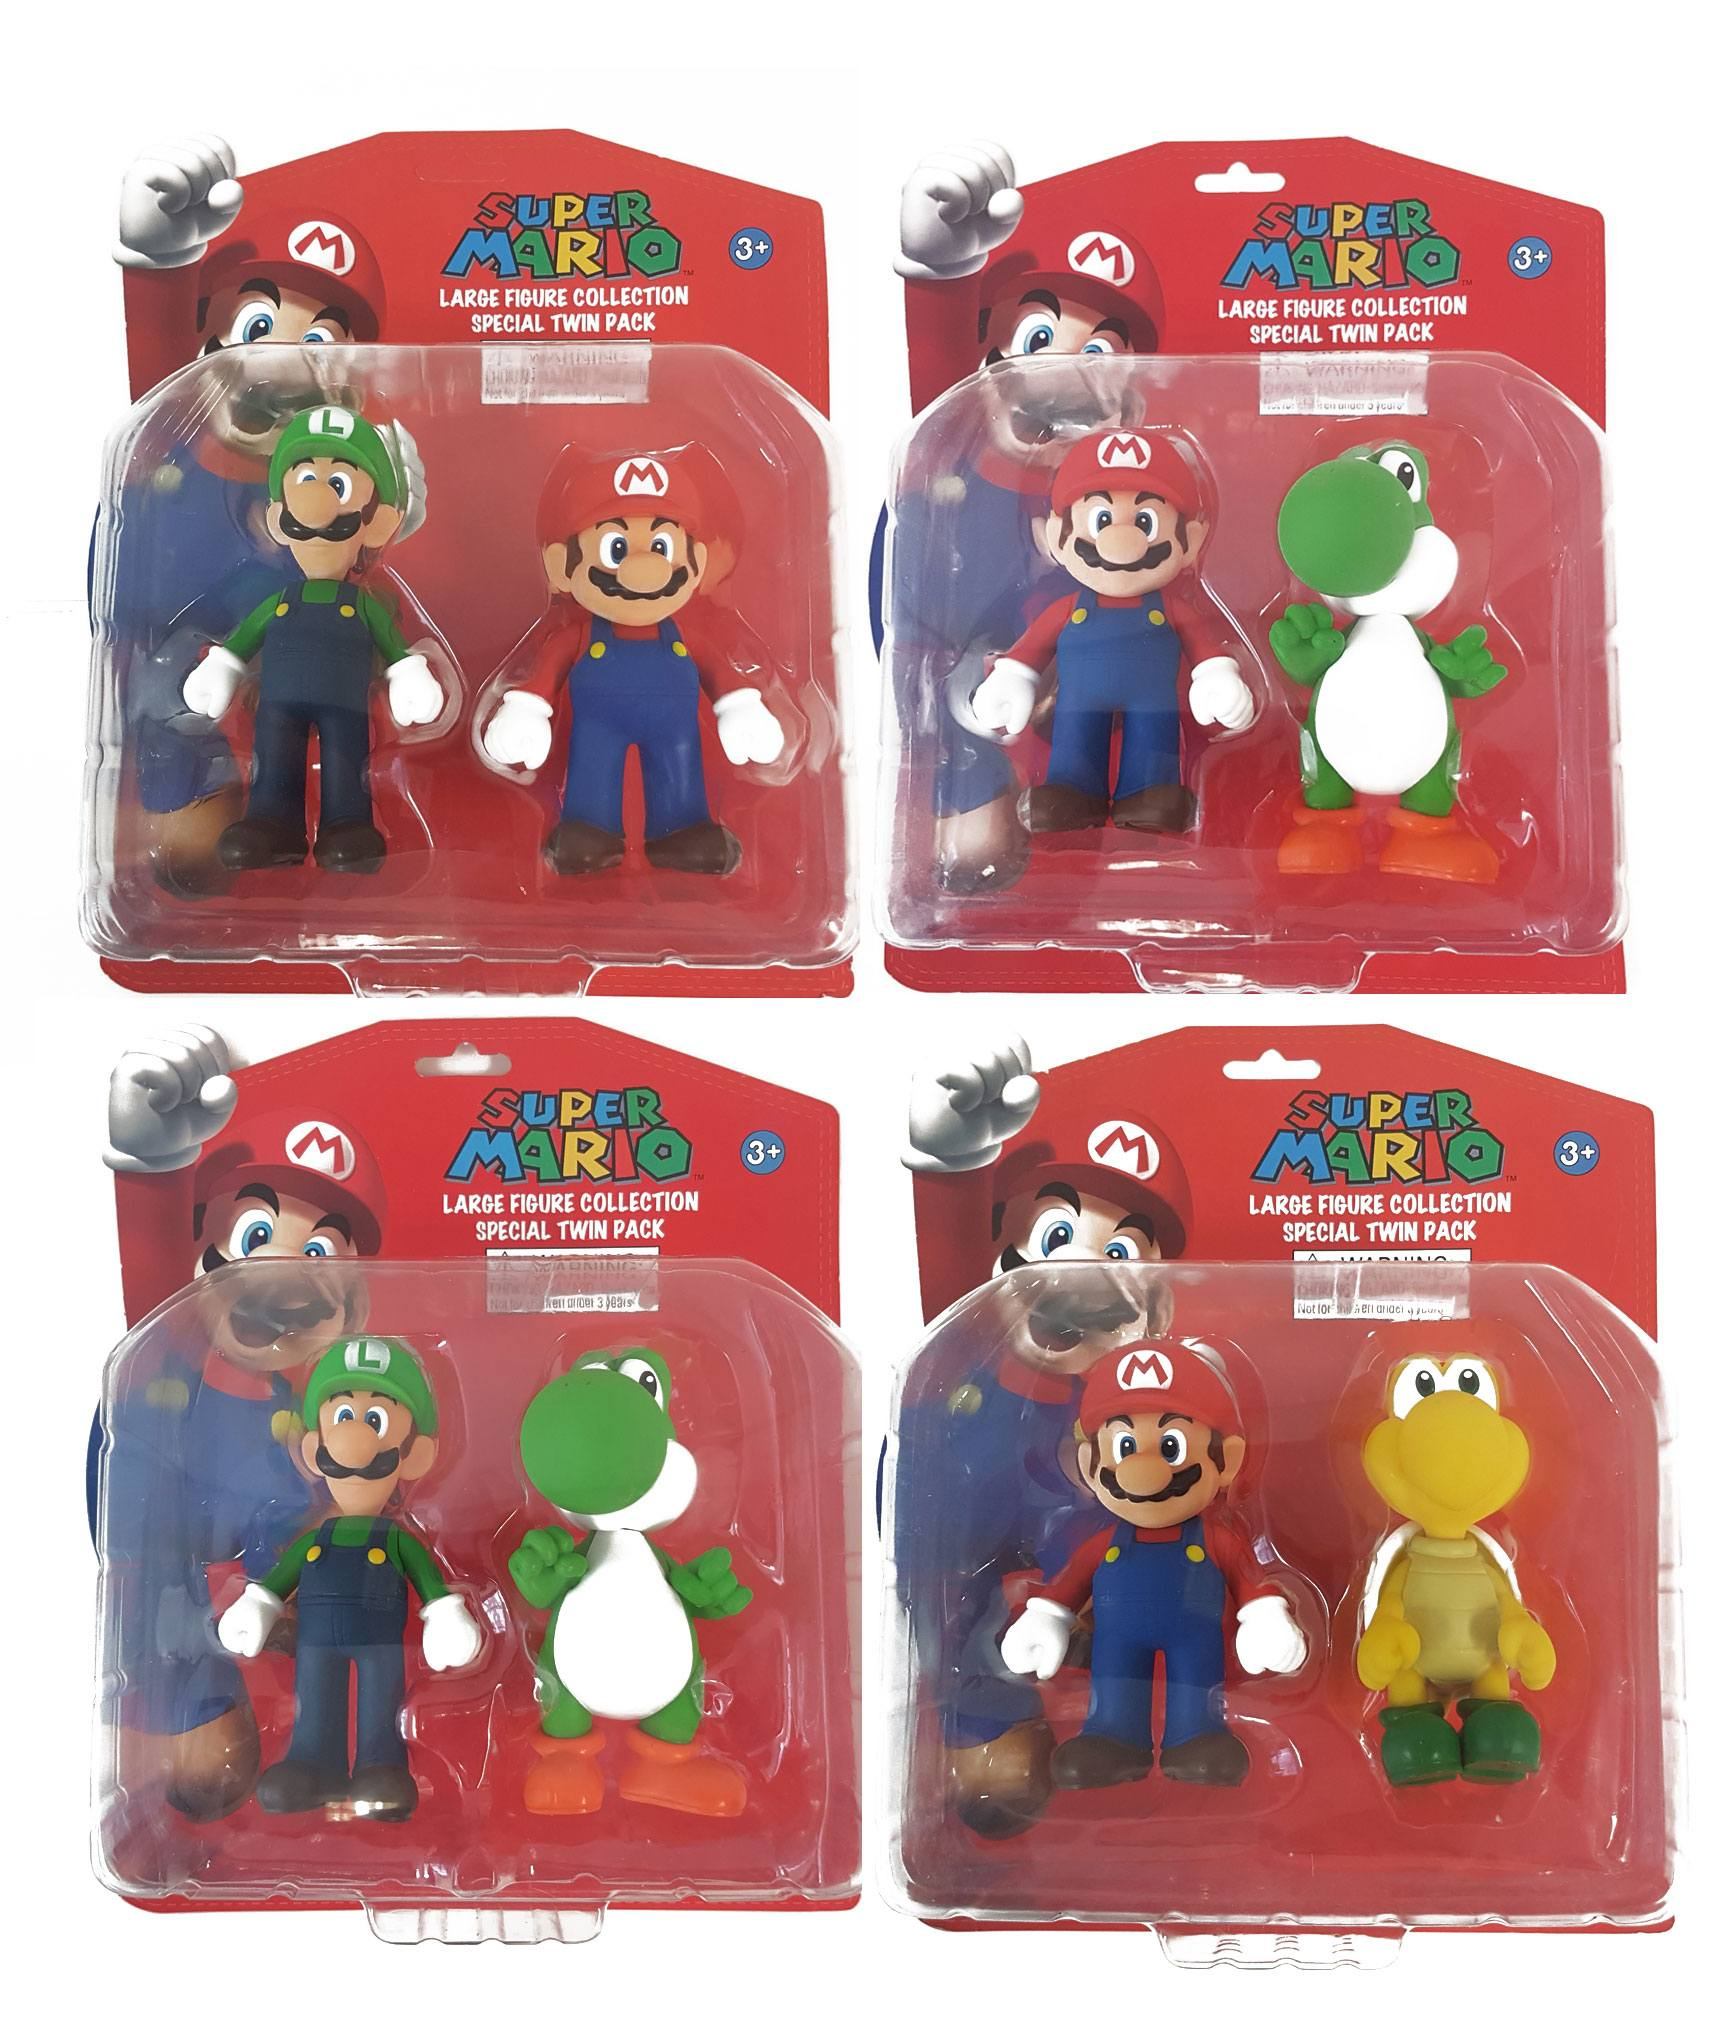 Super Mario Large Collection Action Figures 12 cm 2-Packs Assortment (8)